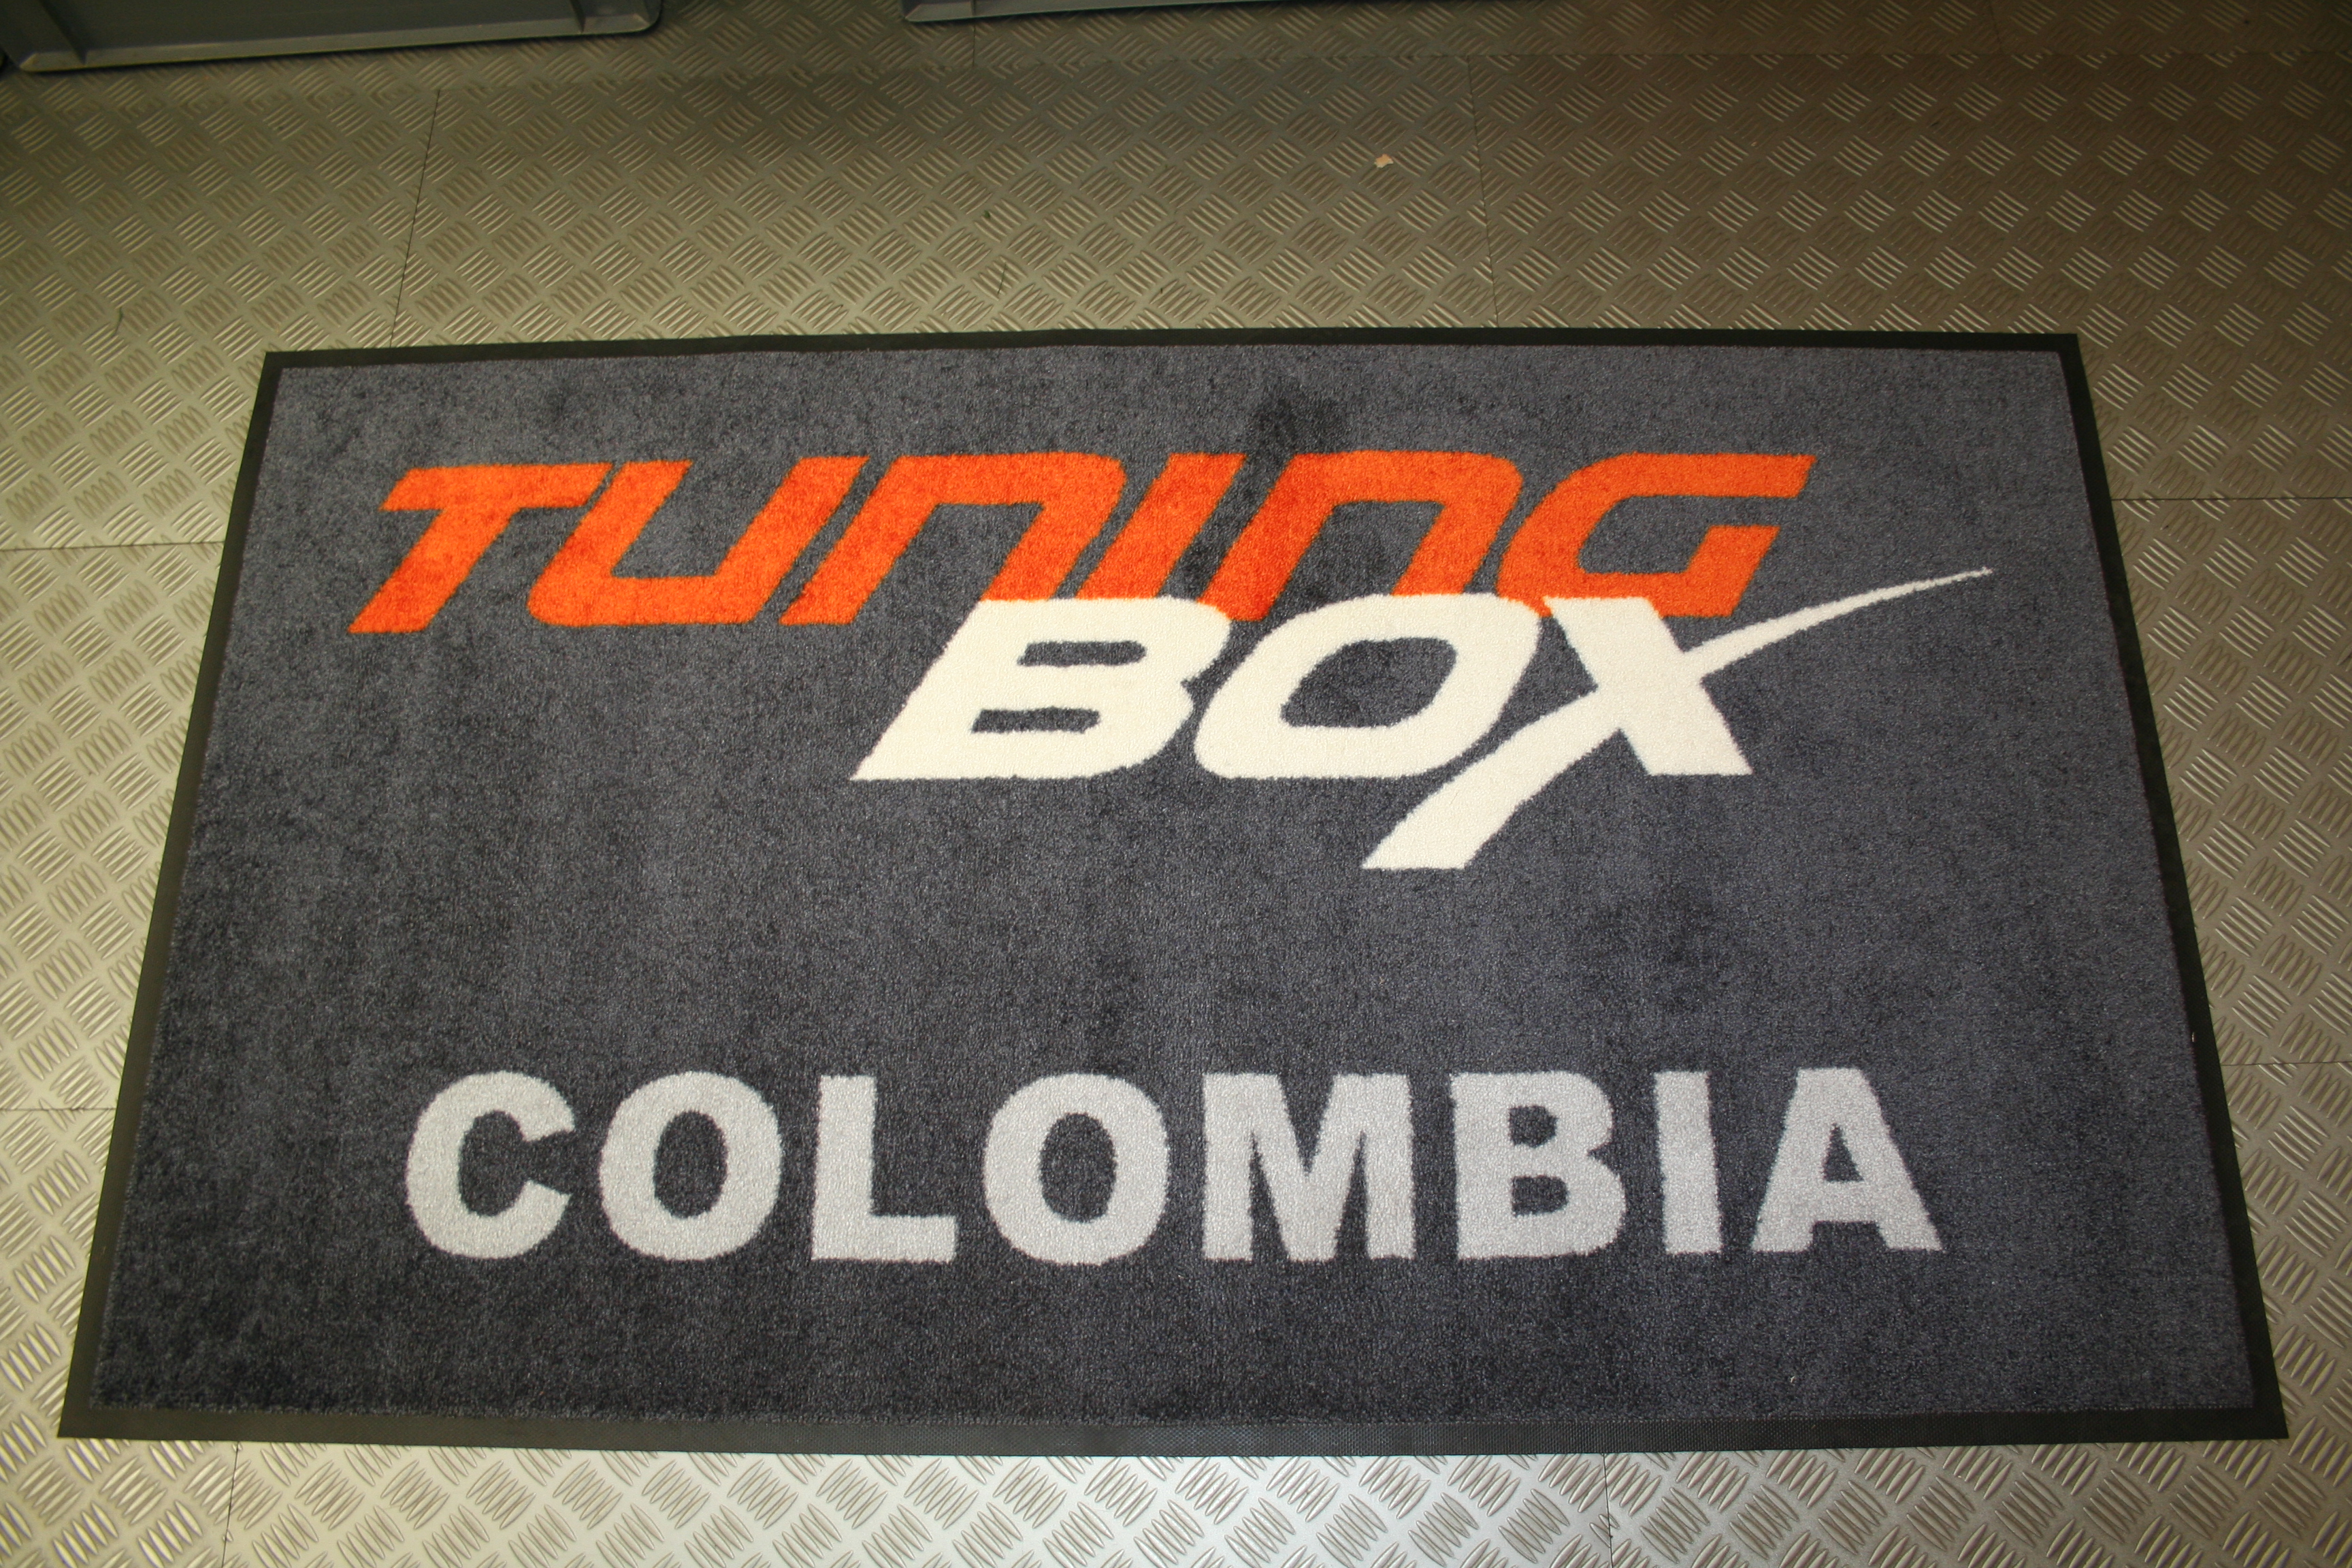 Tapis du2019entru00e9e personnalisu00e9 u00ab Made in Belgium u00bb pour la Colombie ...